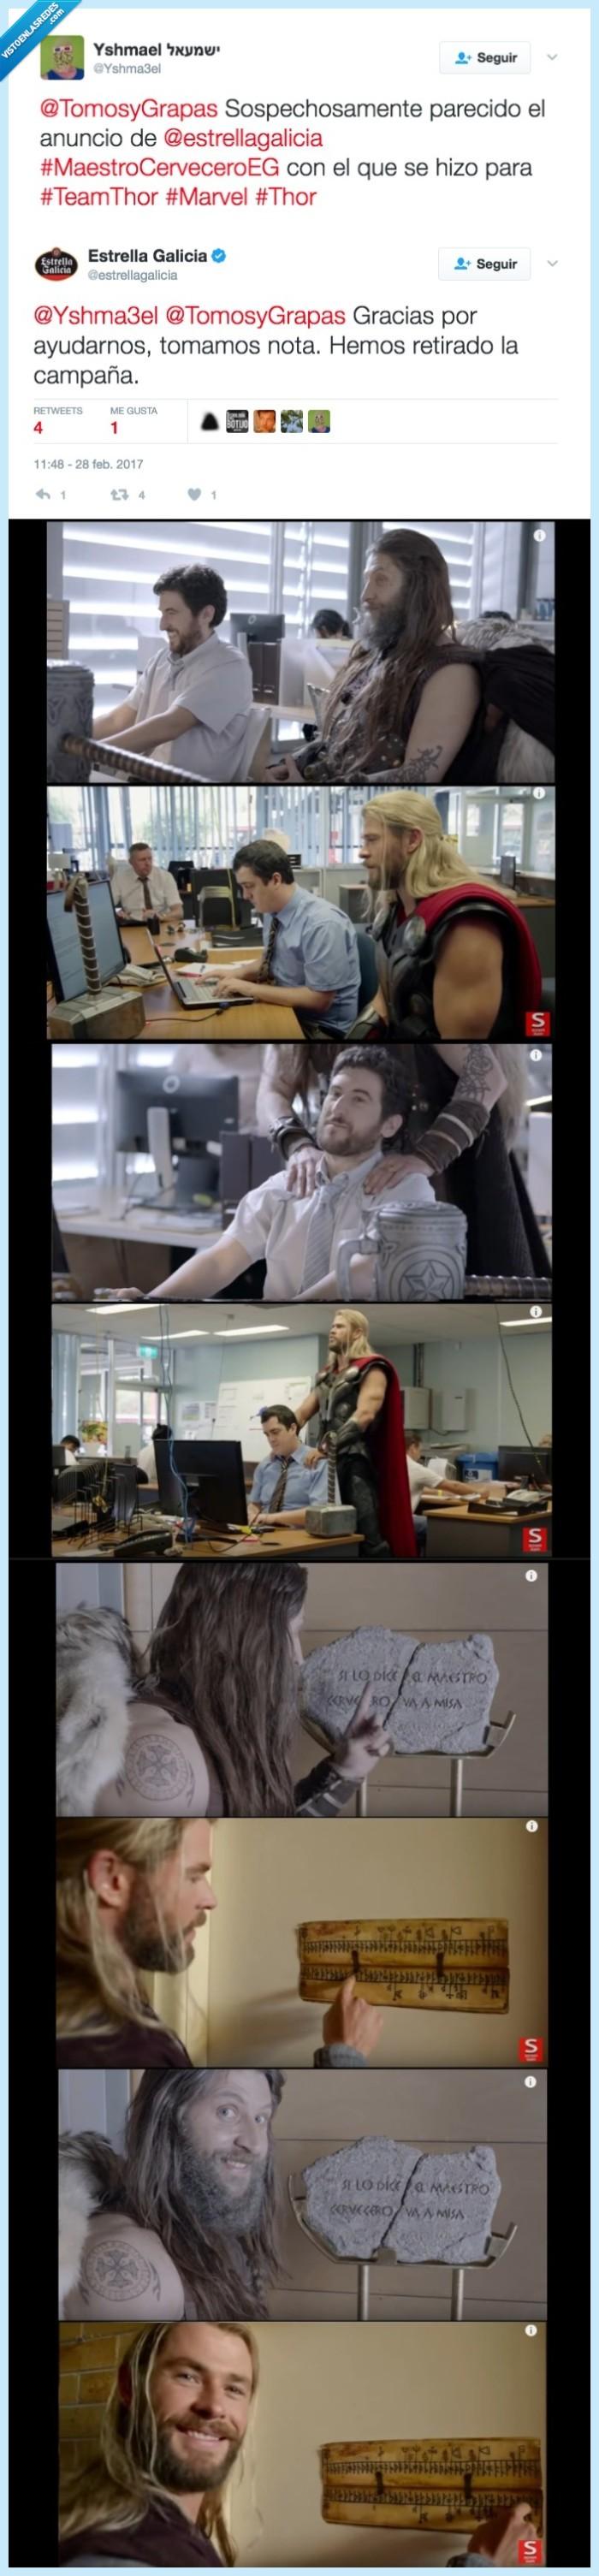 estrella galicia,pillada,plagio,Thor